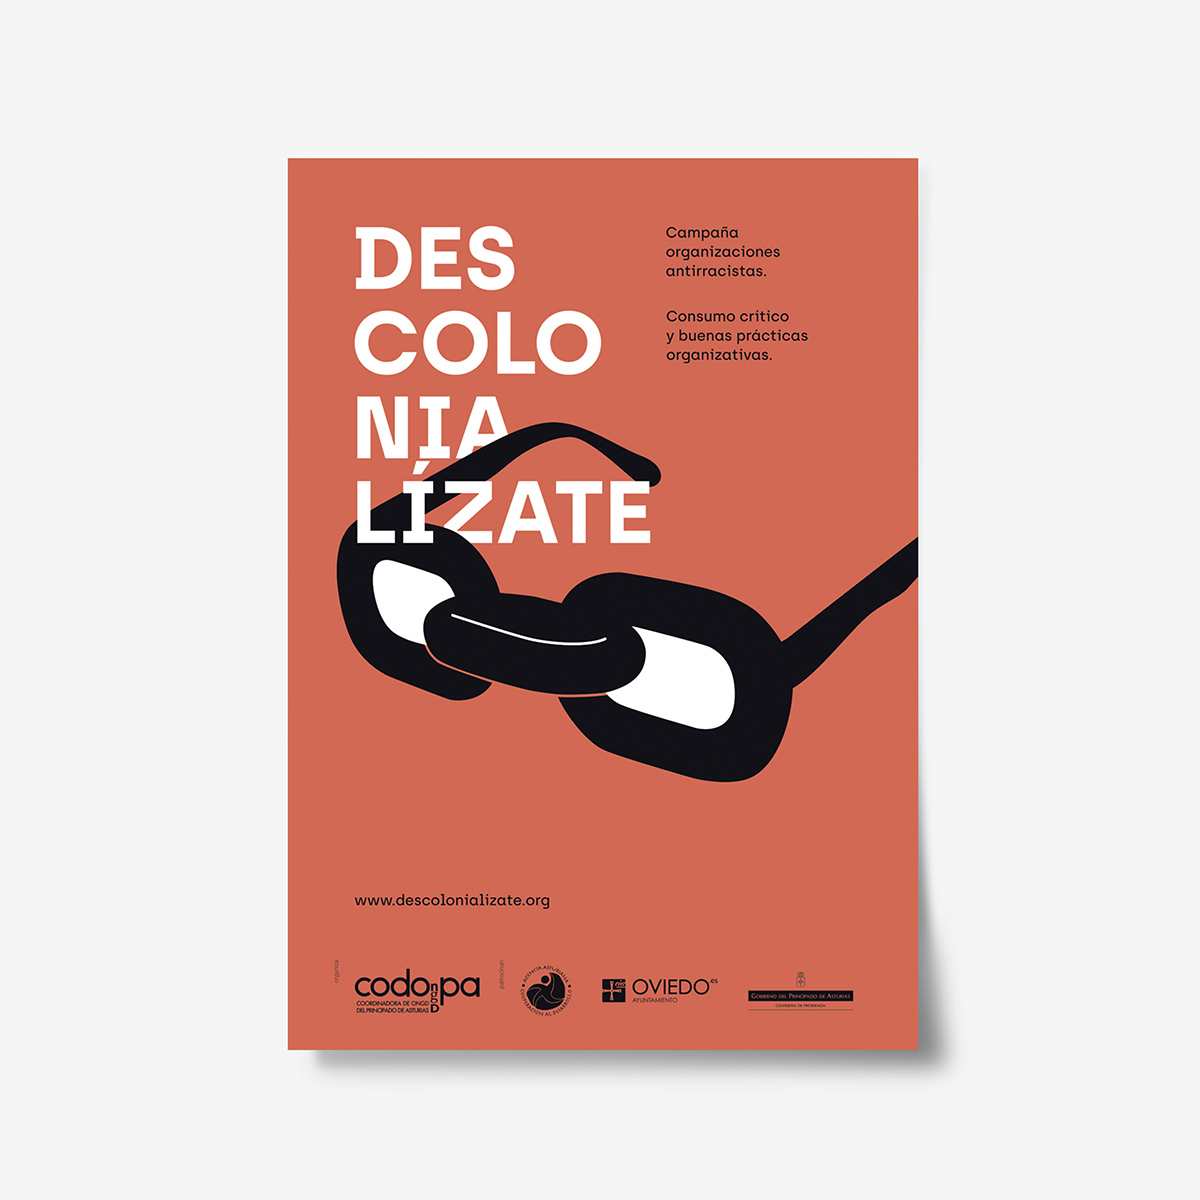 Descolonialízate. Carteles by Goyo Rodríguez